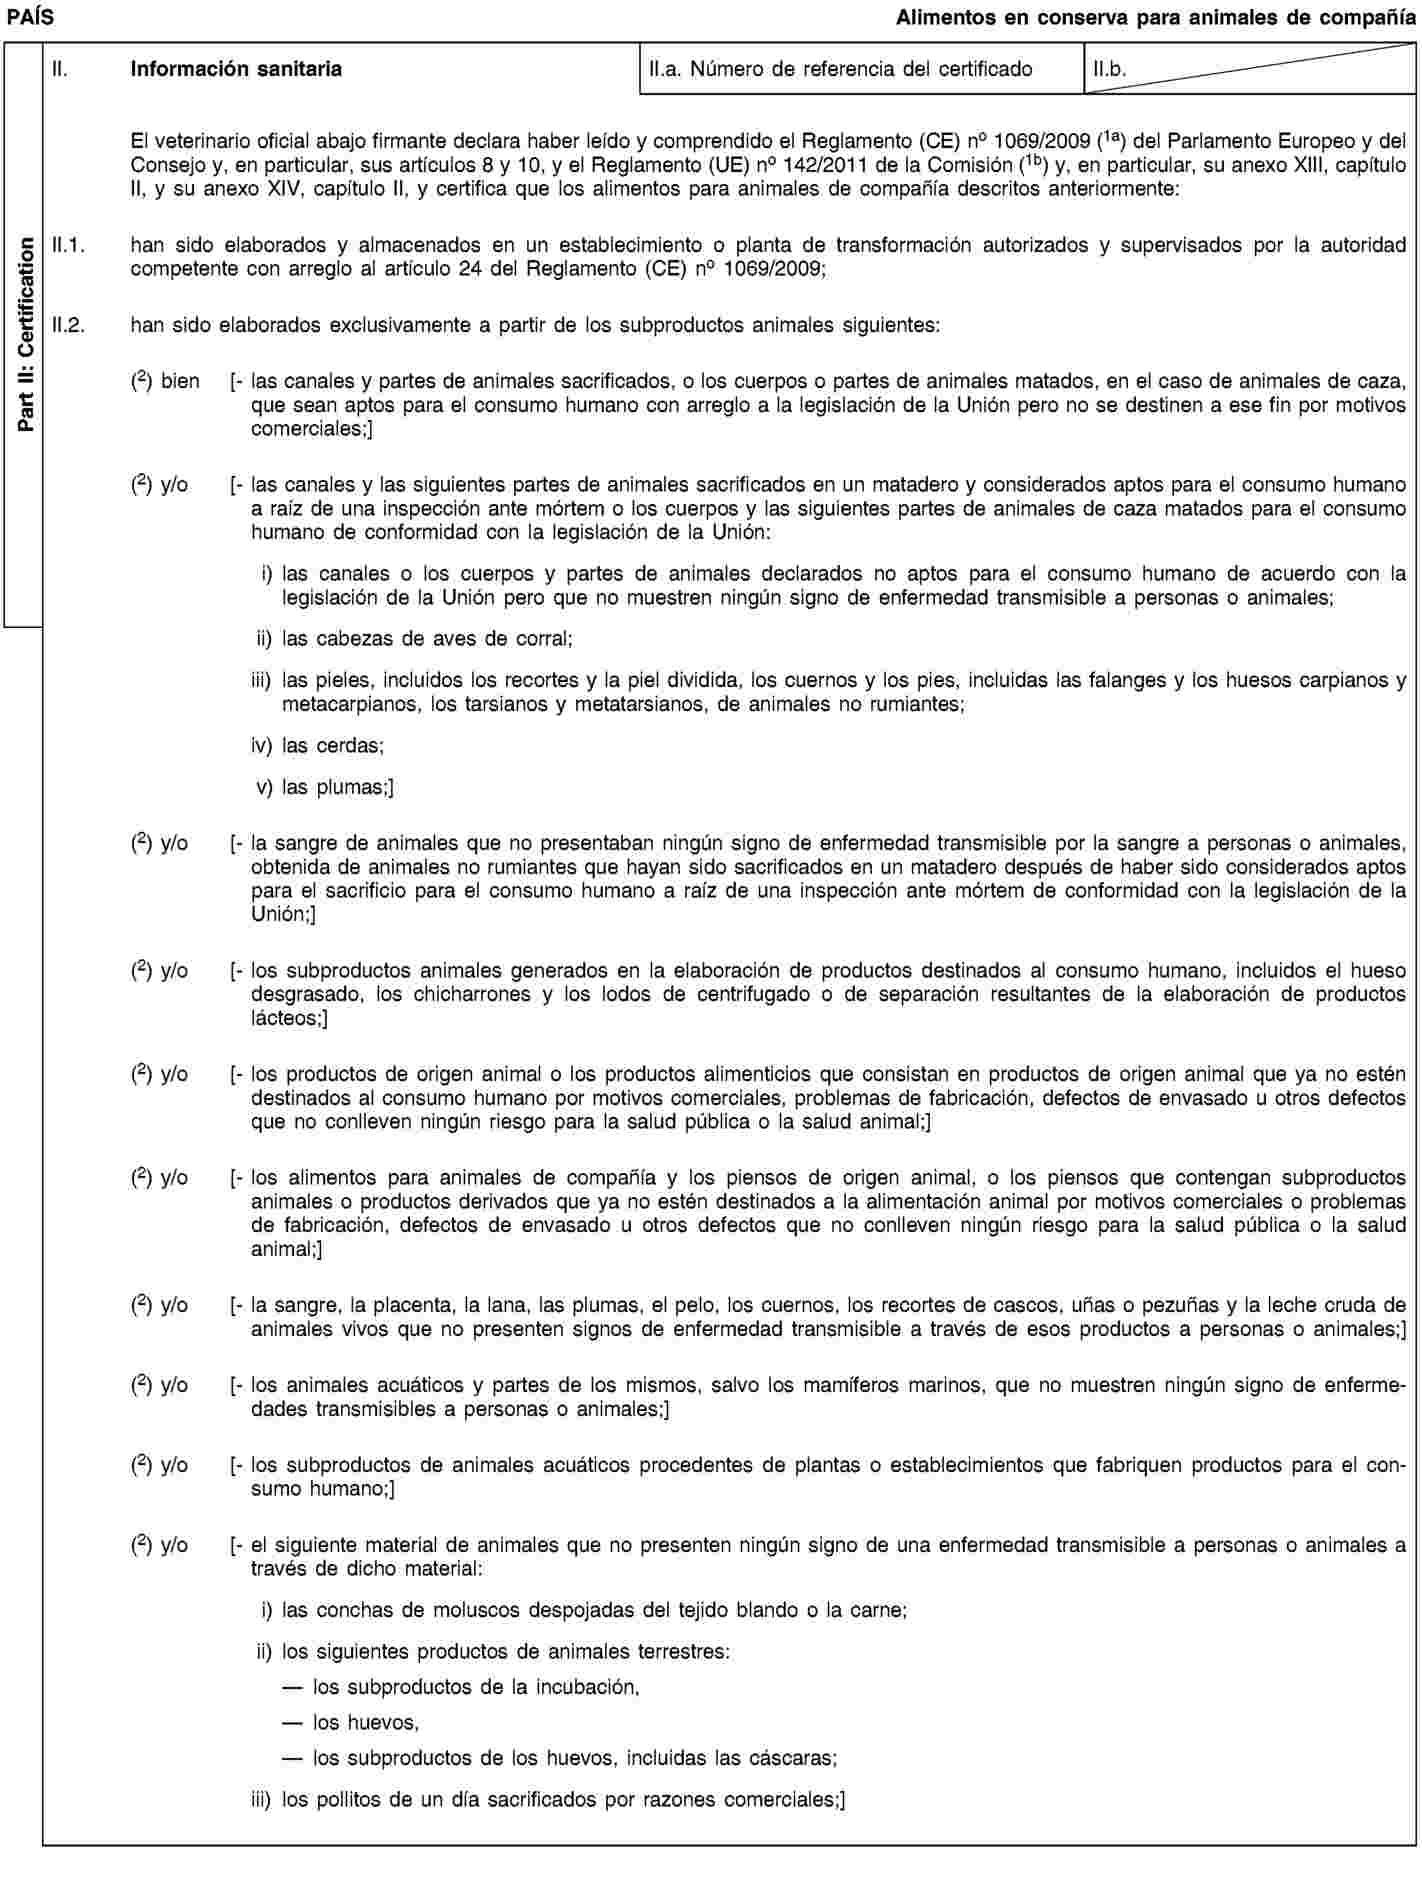 Imagen: https://eur-lex.europa.eu/resource.html?uri=uriserv:OJ.L_.2011.054.01.0001.01.SPA.xhtml.L_2011054ES.01013301.tif.jpg